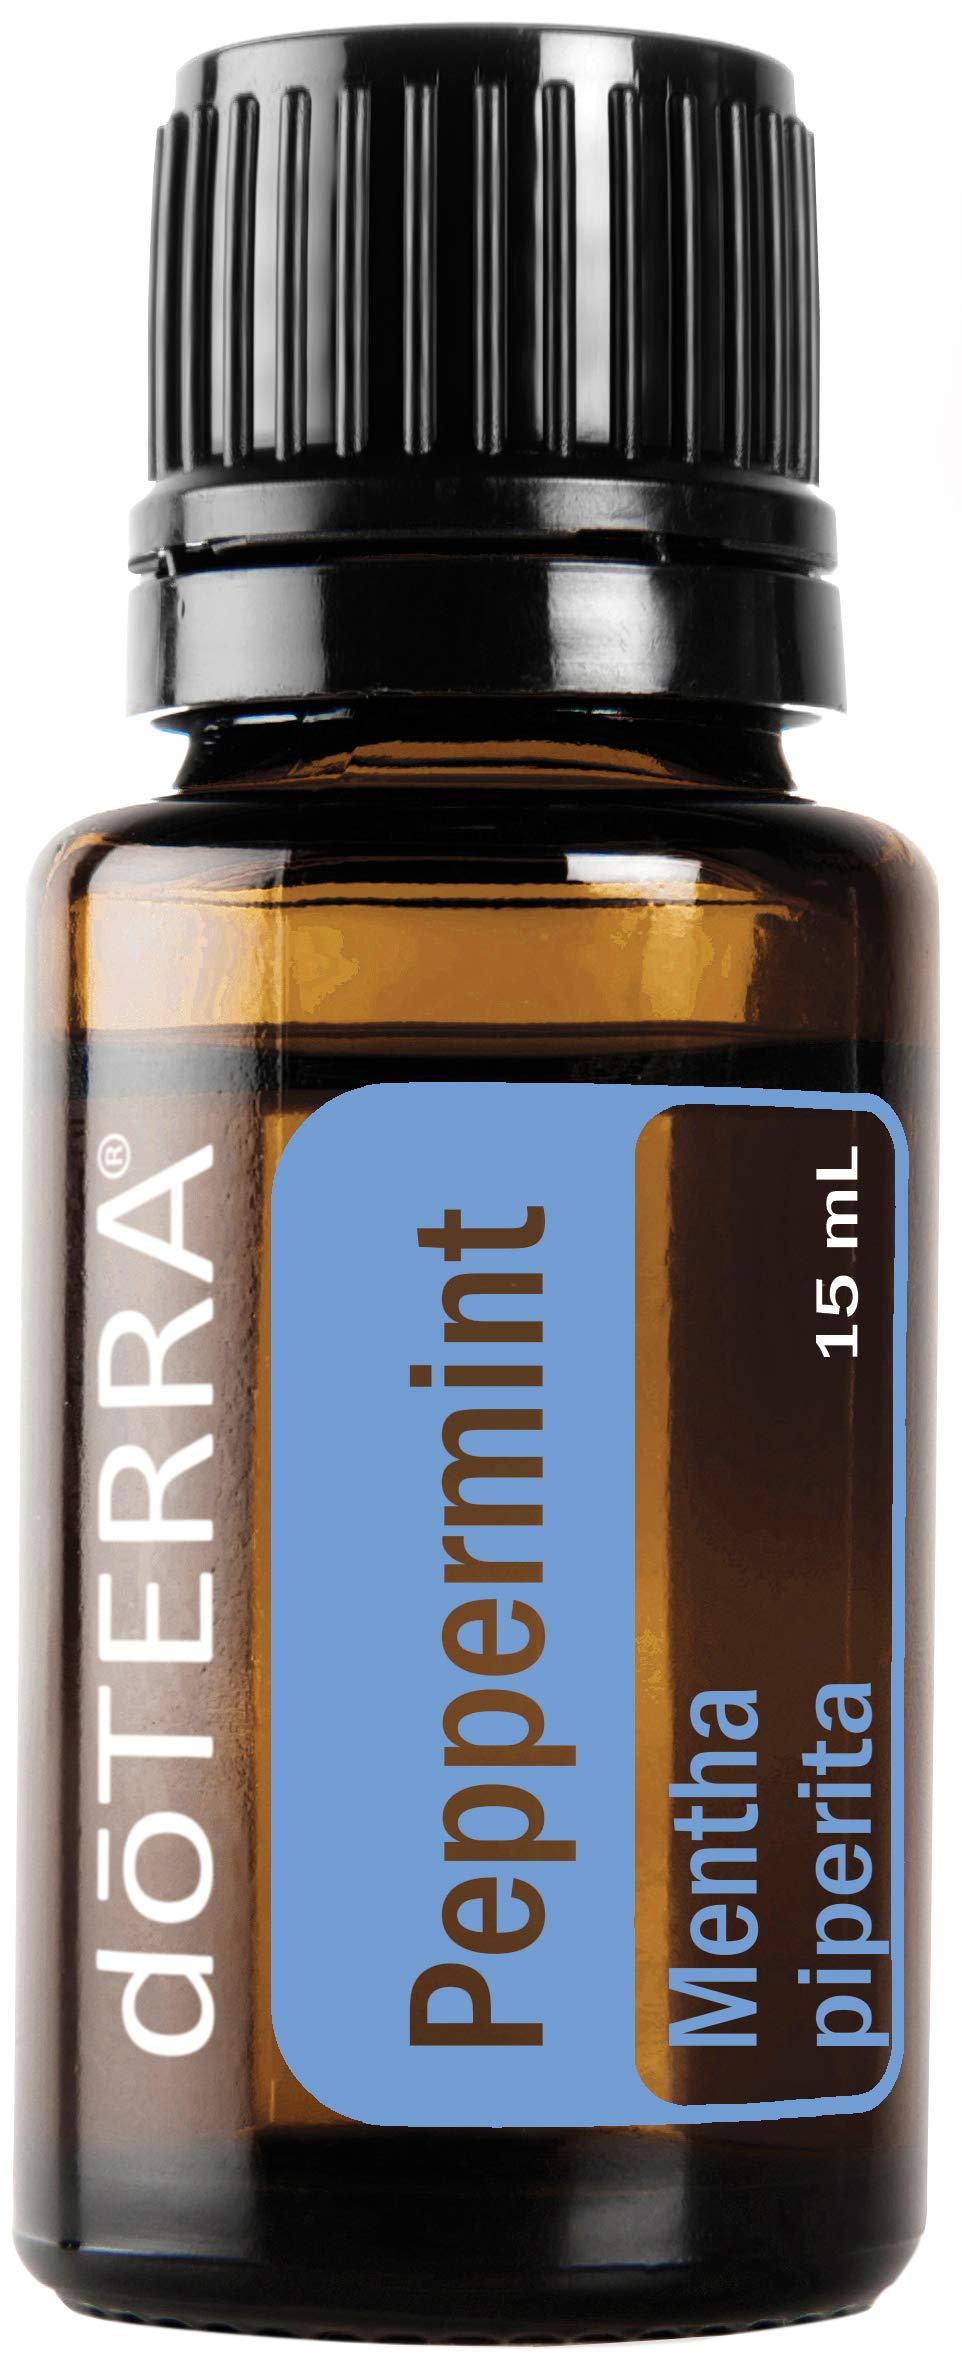 doTERRA - Peppermint Essential Oil - 15 mL